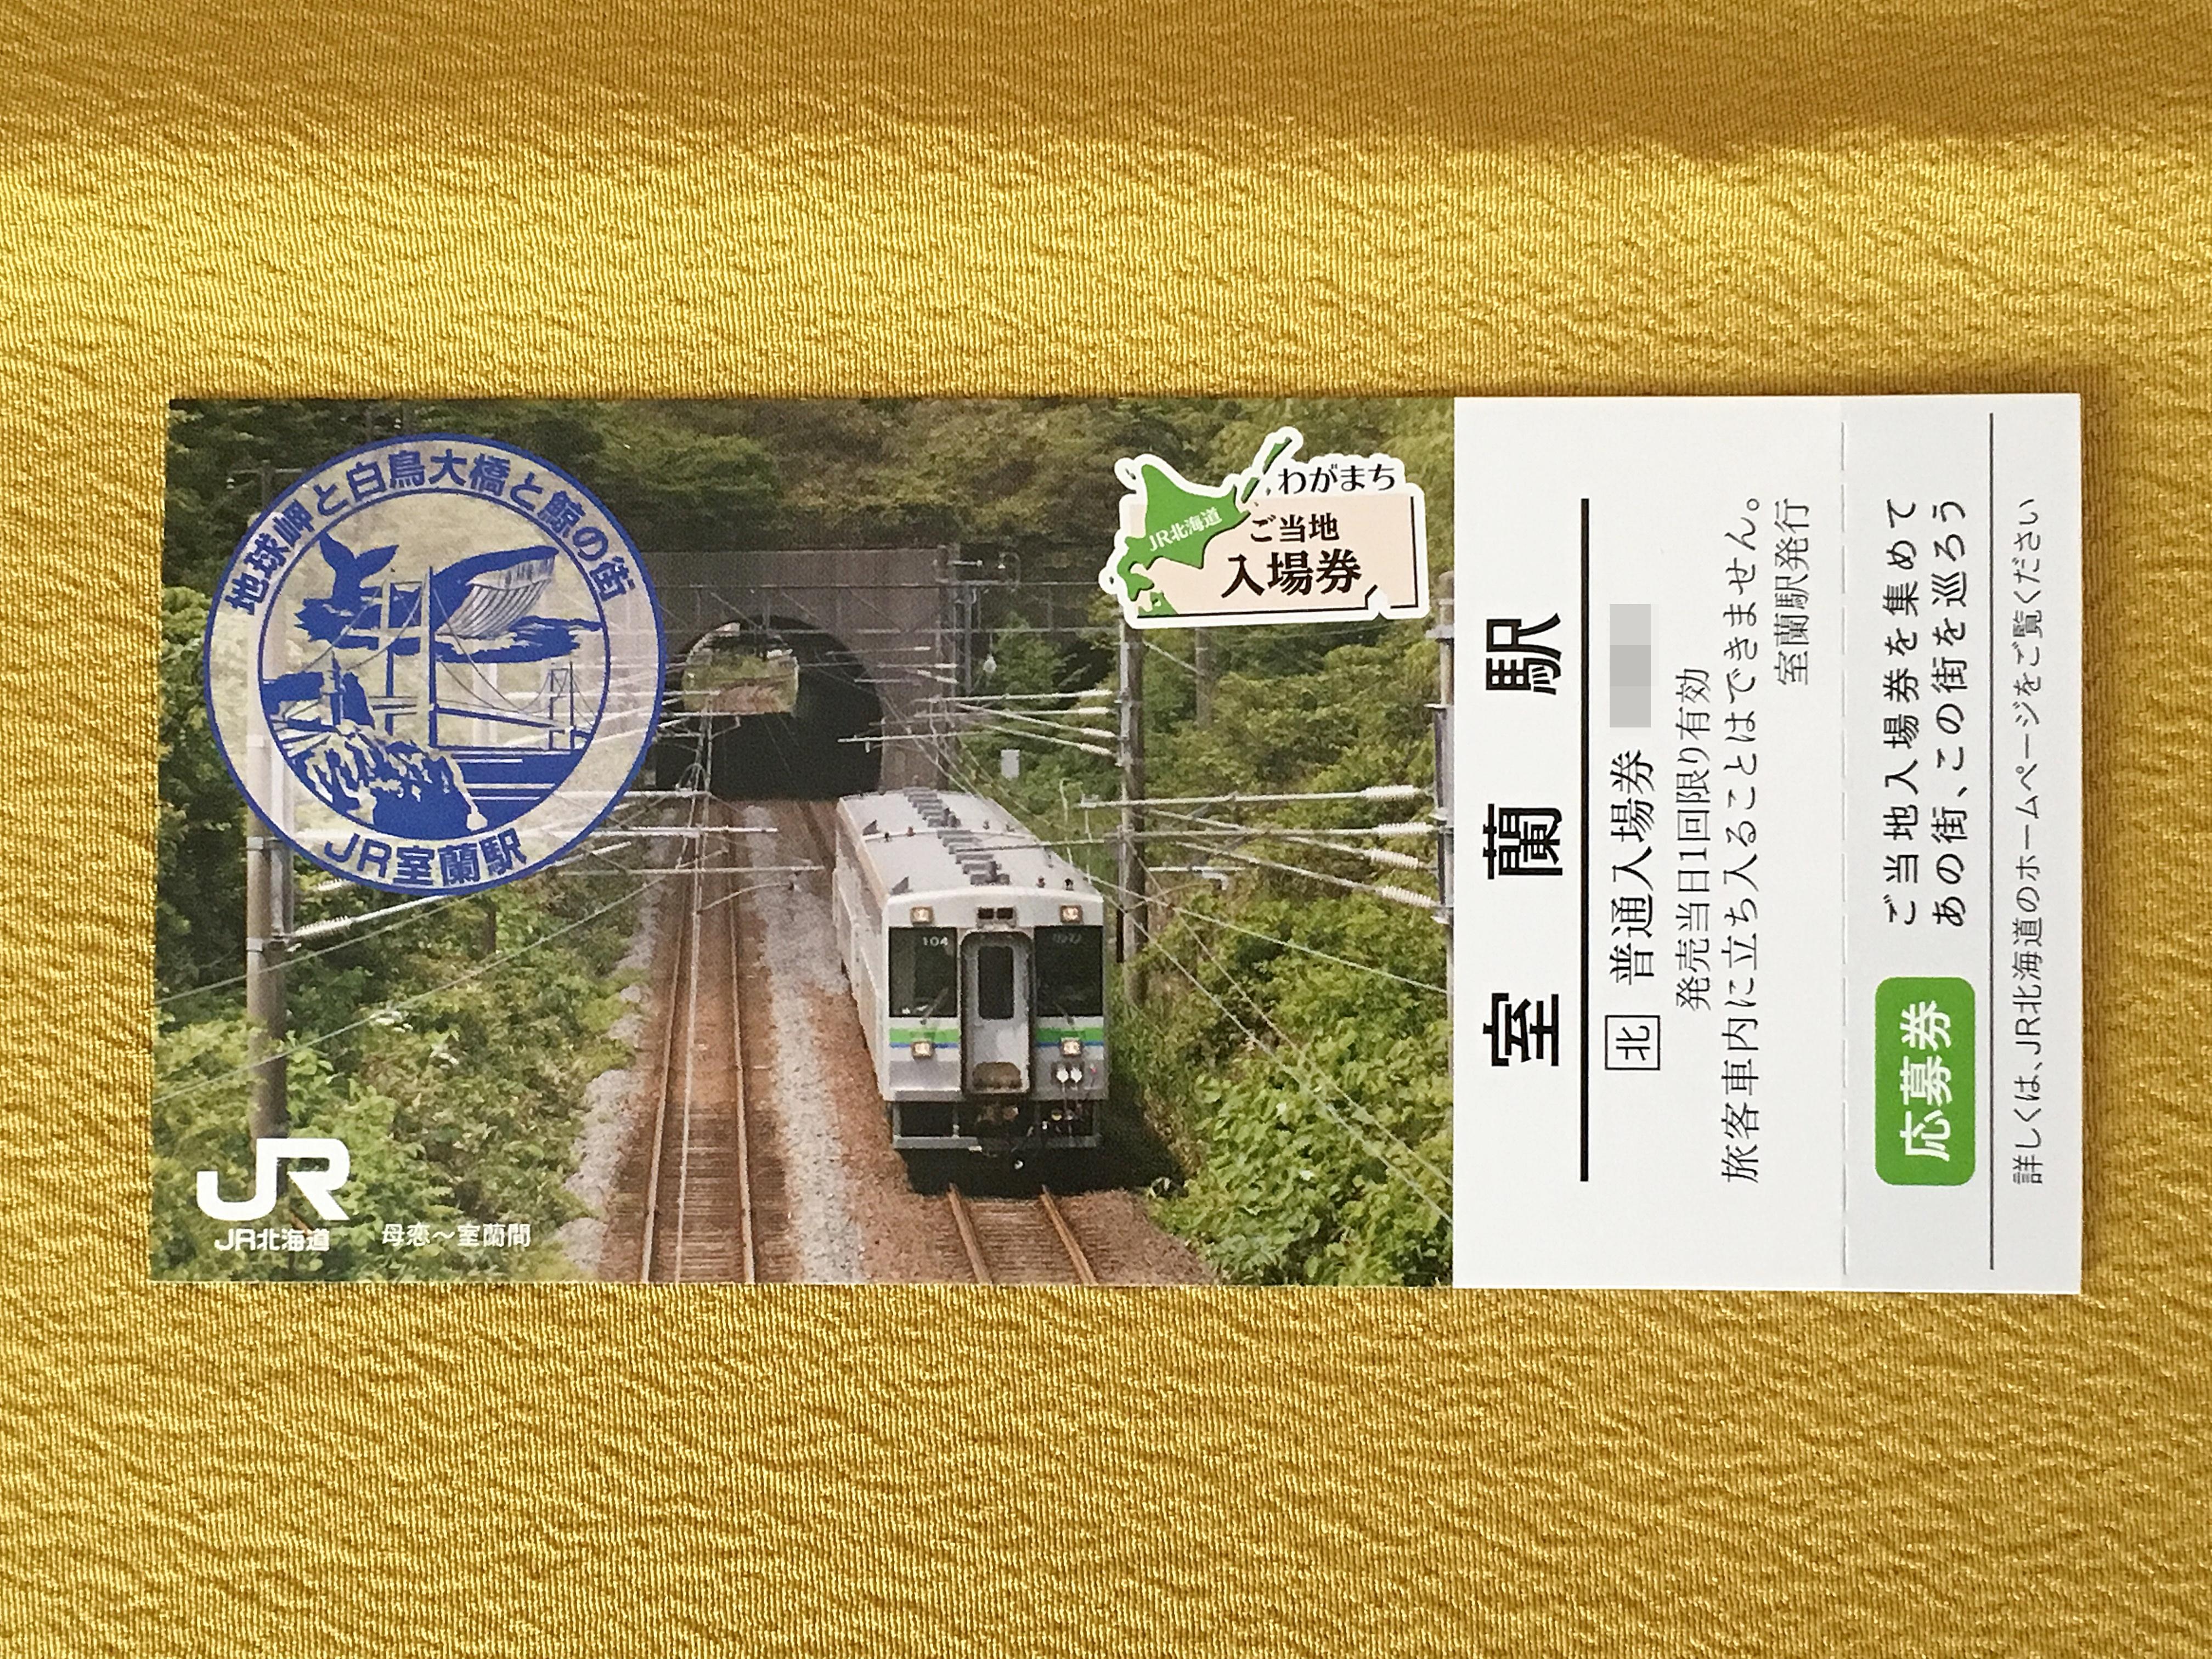 JR北海道ご当地入場券 室蘭駅表.JPG